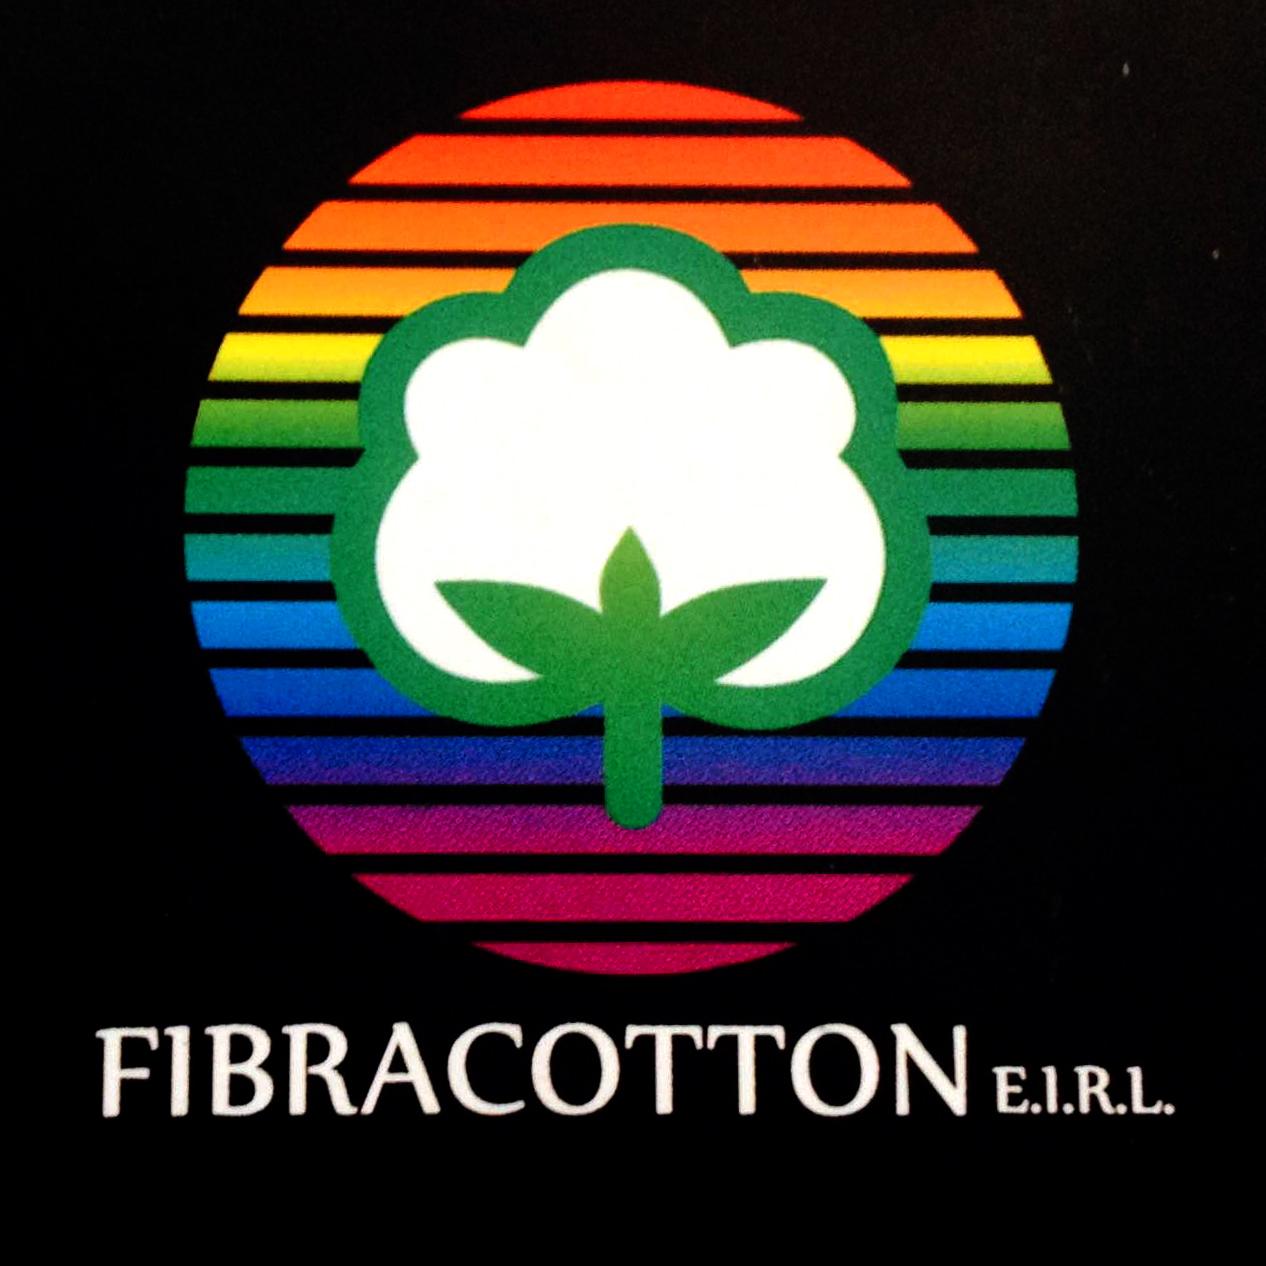 FIBRACOTTON